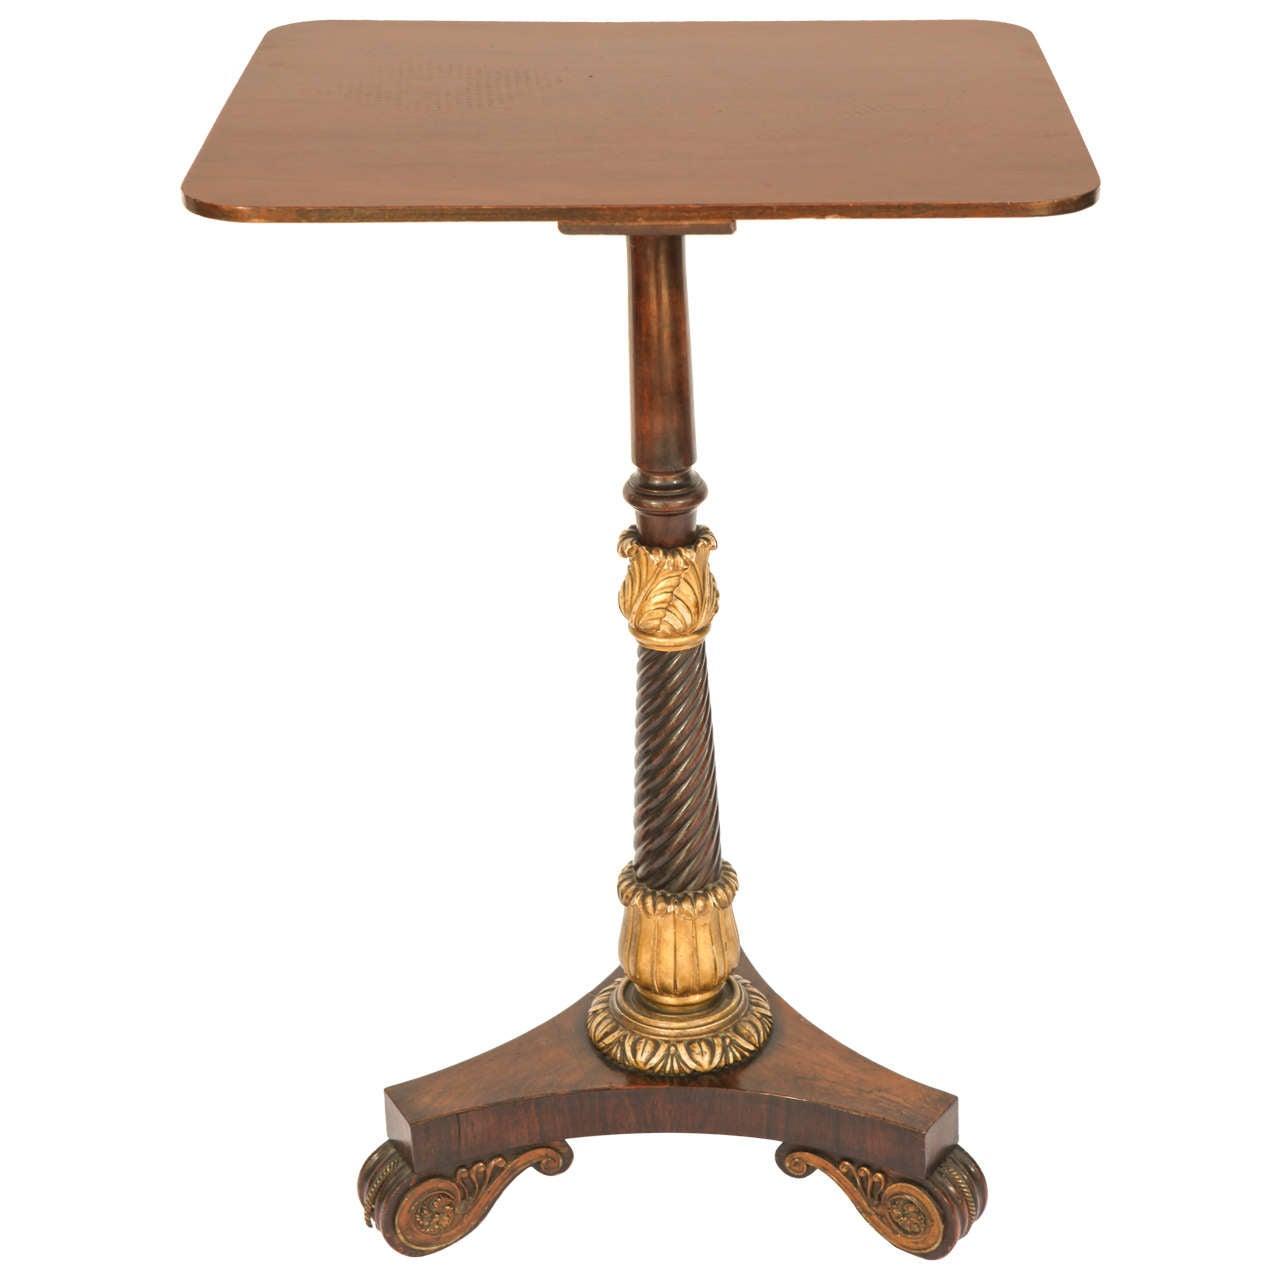 19th Century English Regency Tripod Mahogany Pedestal Table